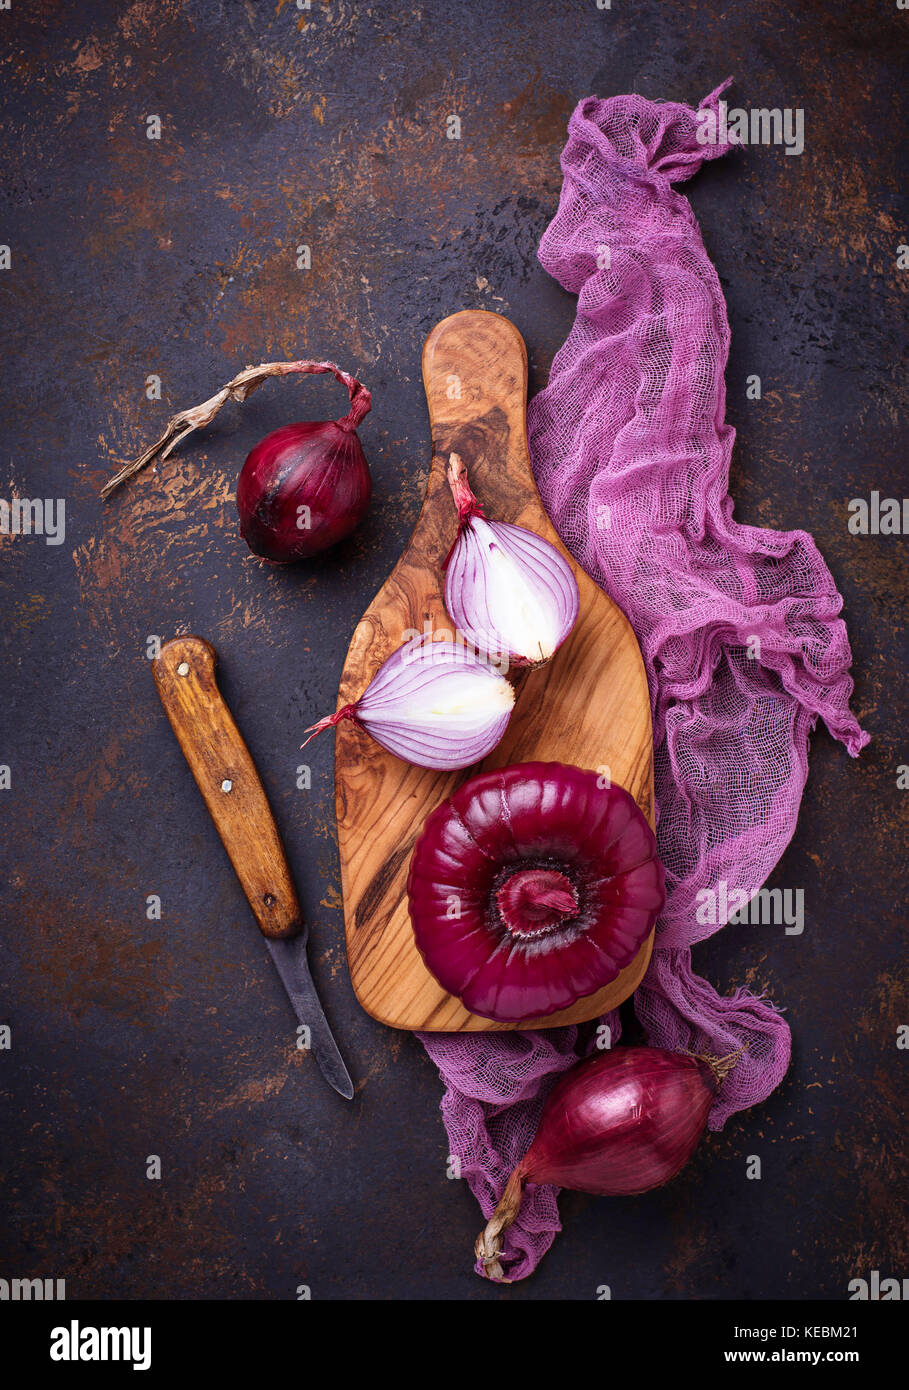 La cebolla roja sobre fondo oxidado viejo. Foto de stock